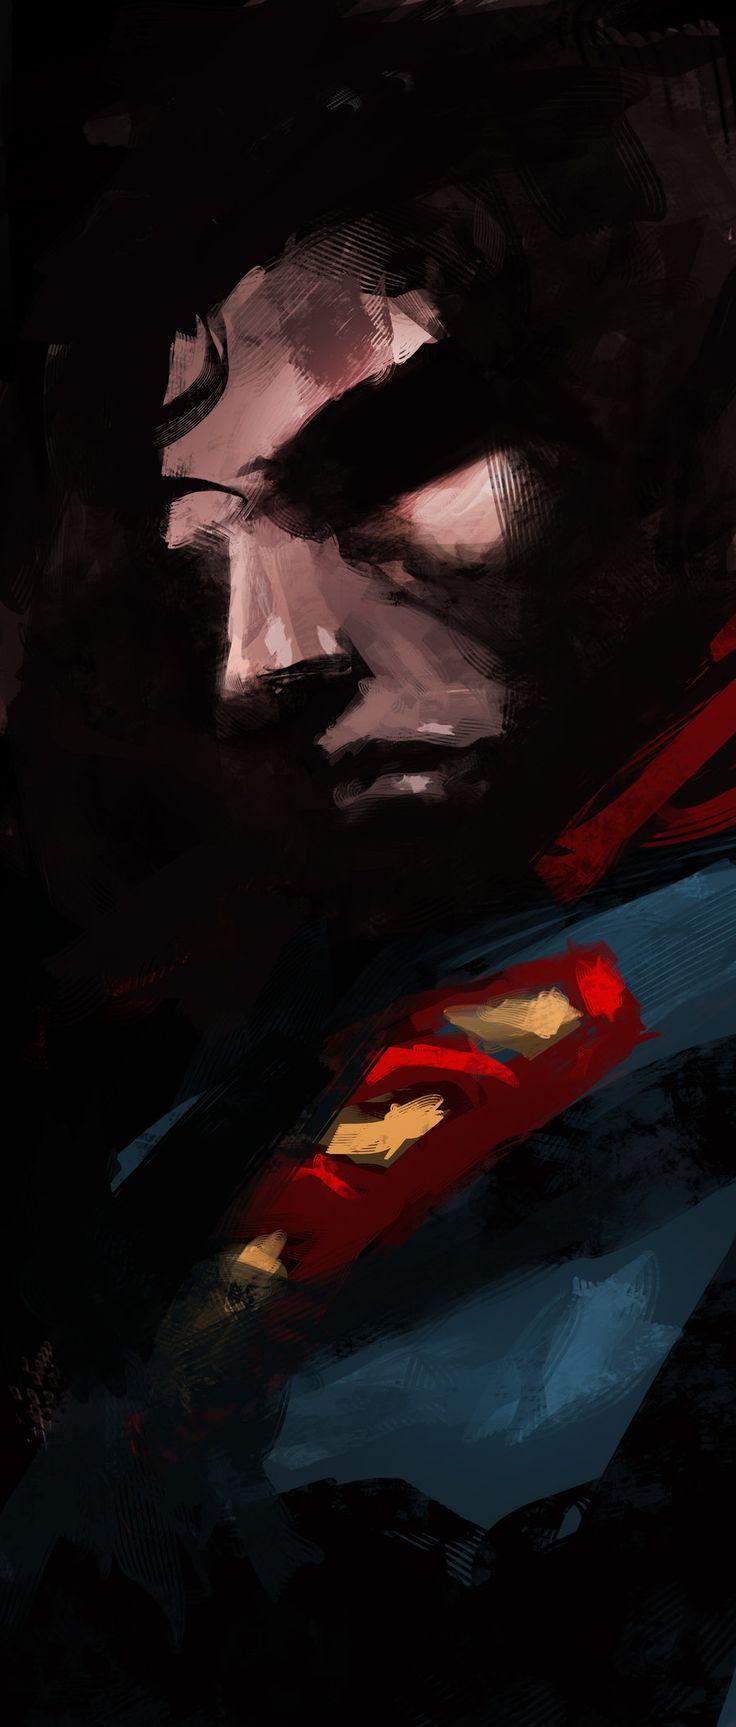 superman 3 by Eliaskhasho.deviantart.com on @deviantART